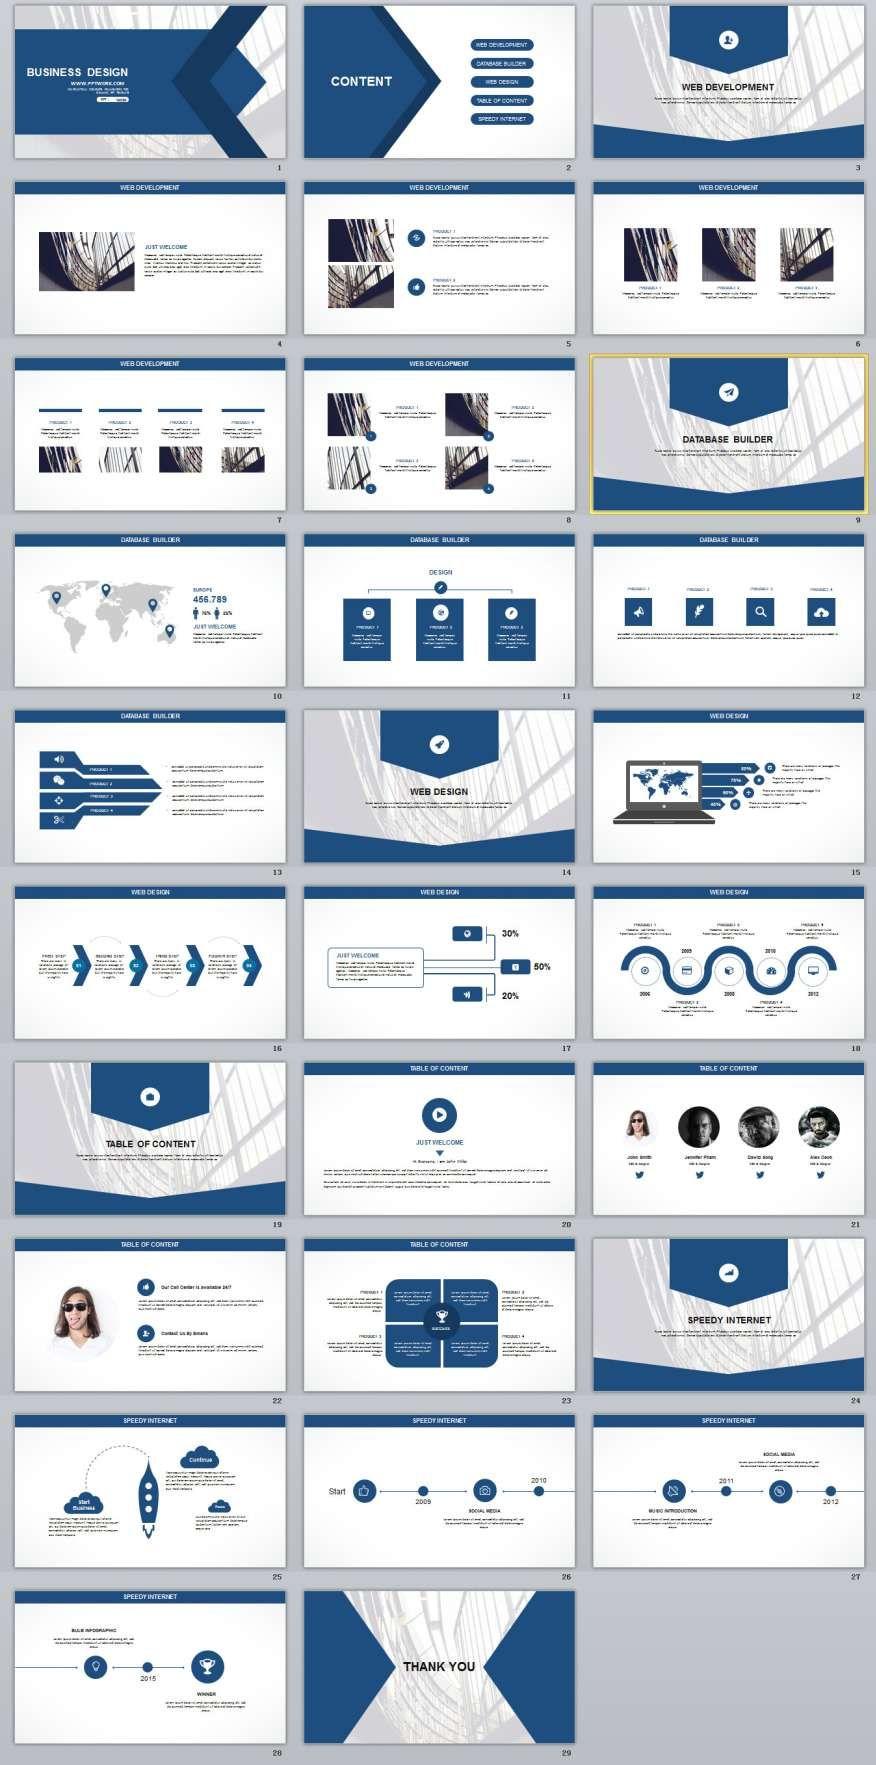 29 blue white business report powerpoint templates 2018 29 blue white business report powerpoint templates toneelgroepblik Choice Image